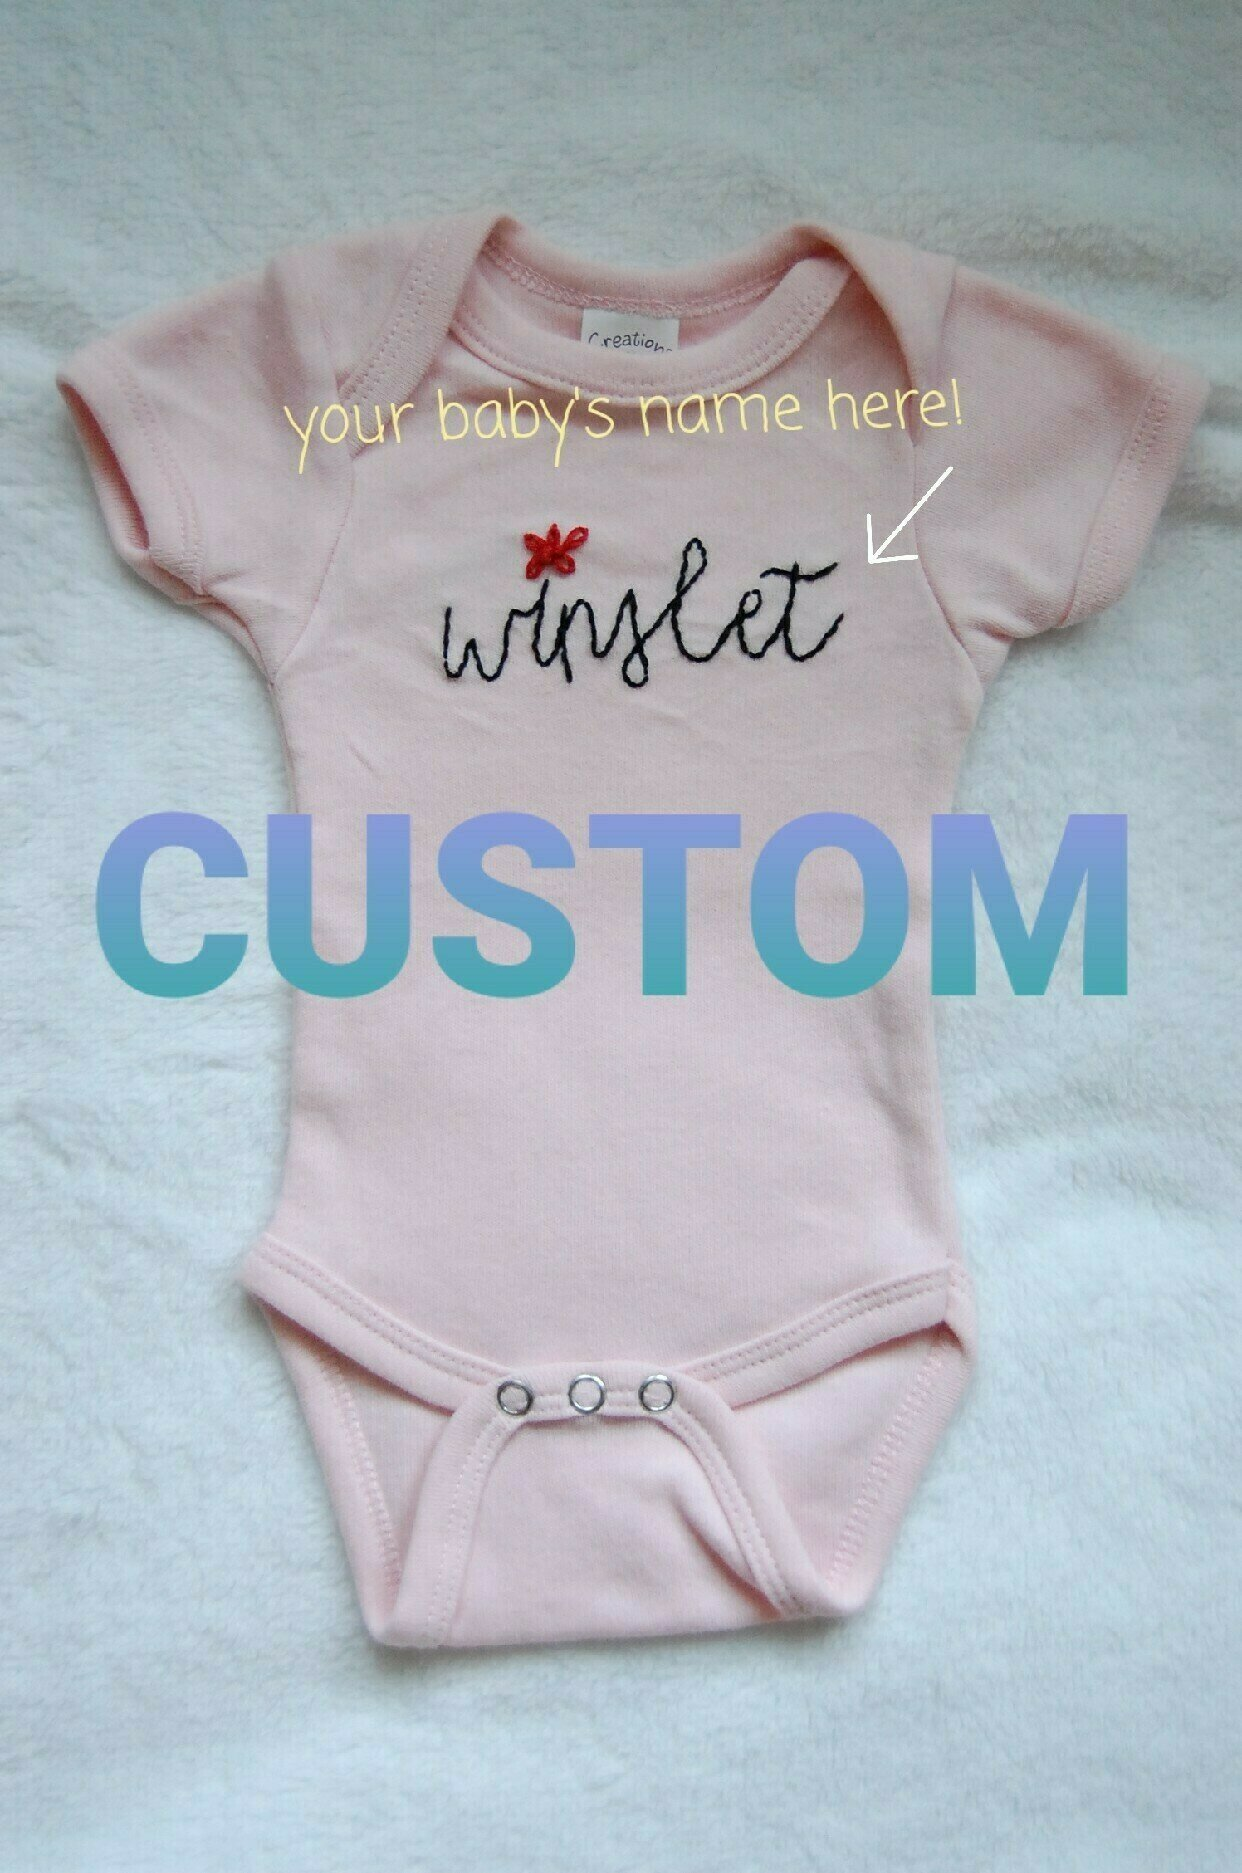 Personalized appliqu\u00e9d patchwork flower baby onesie